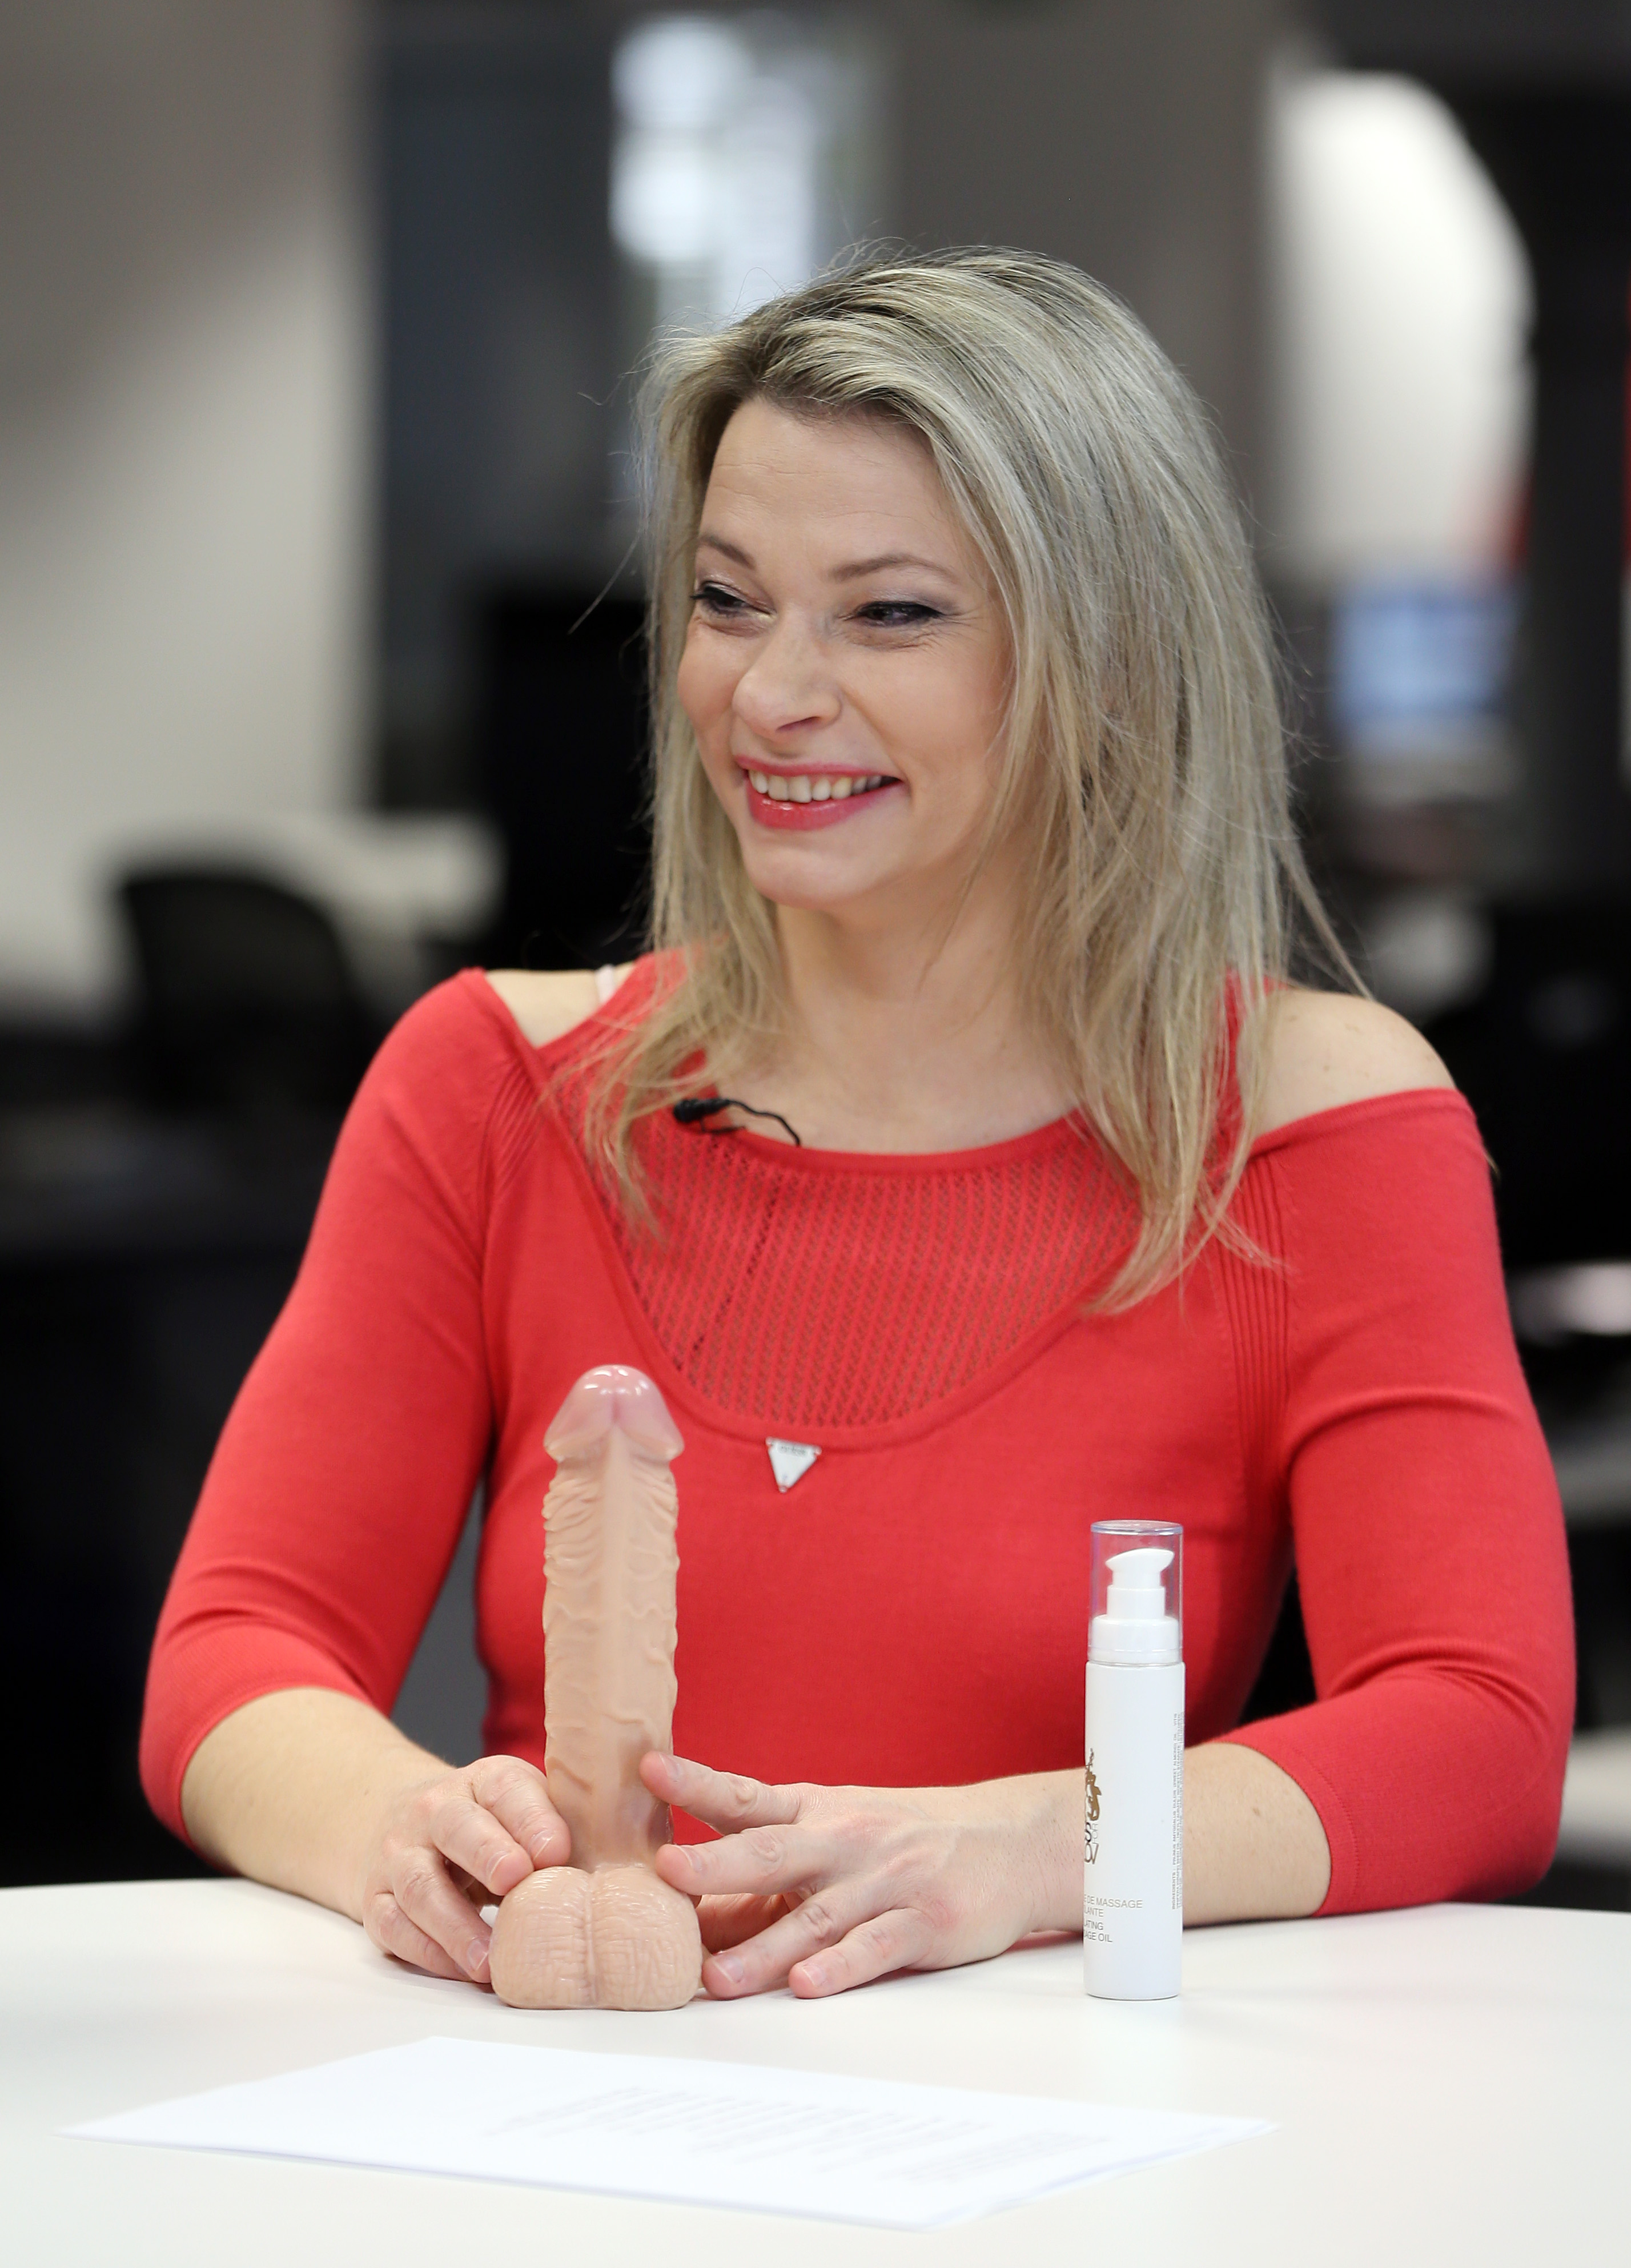 erotika free video masáž penisu